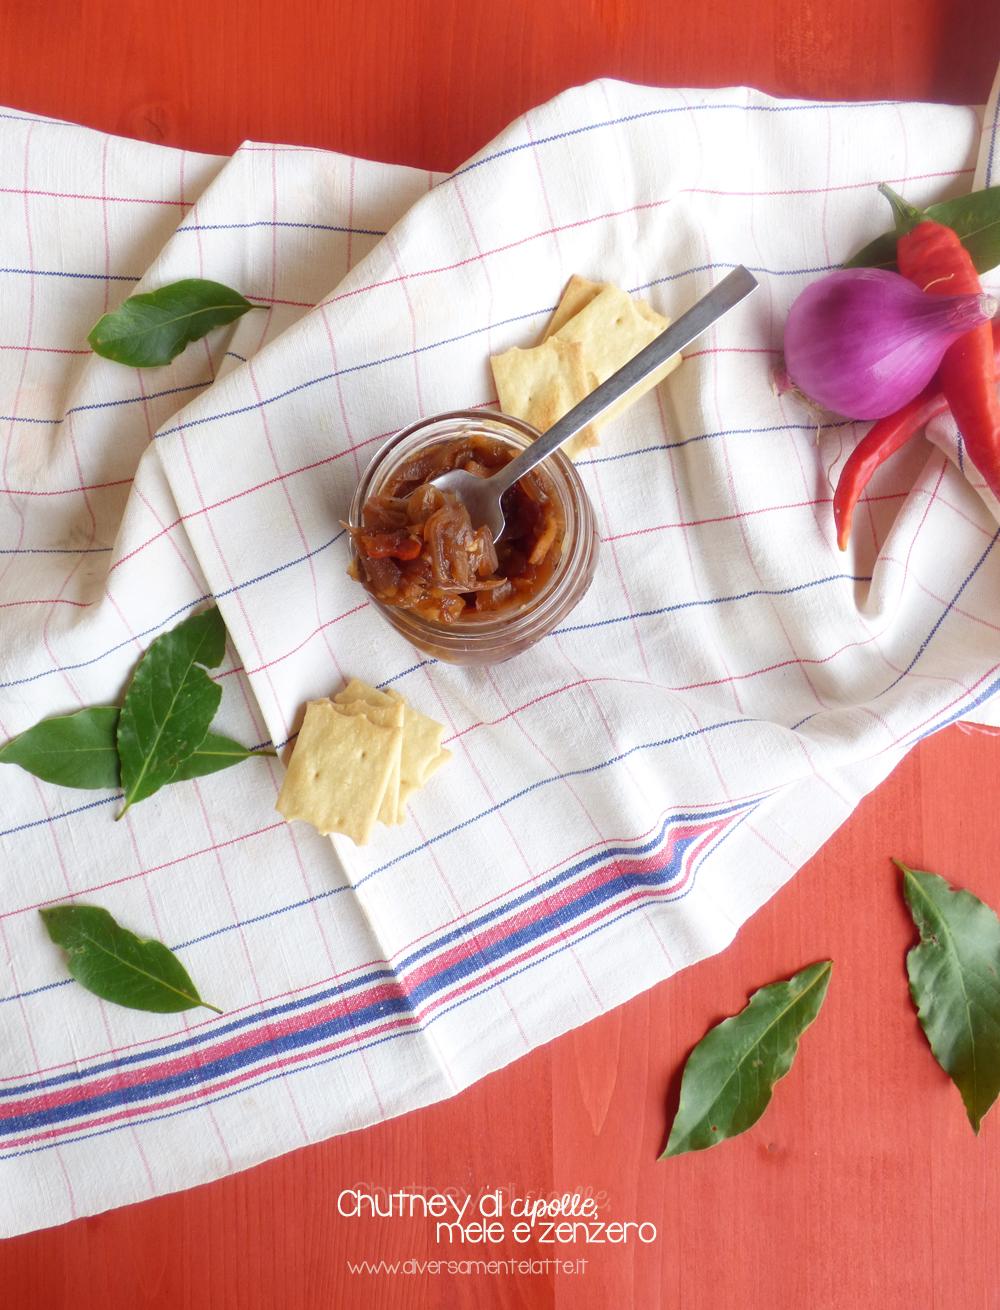 chutney di cipolle mele e zenzero